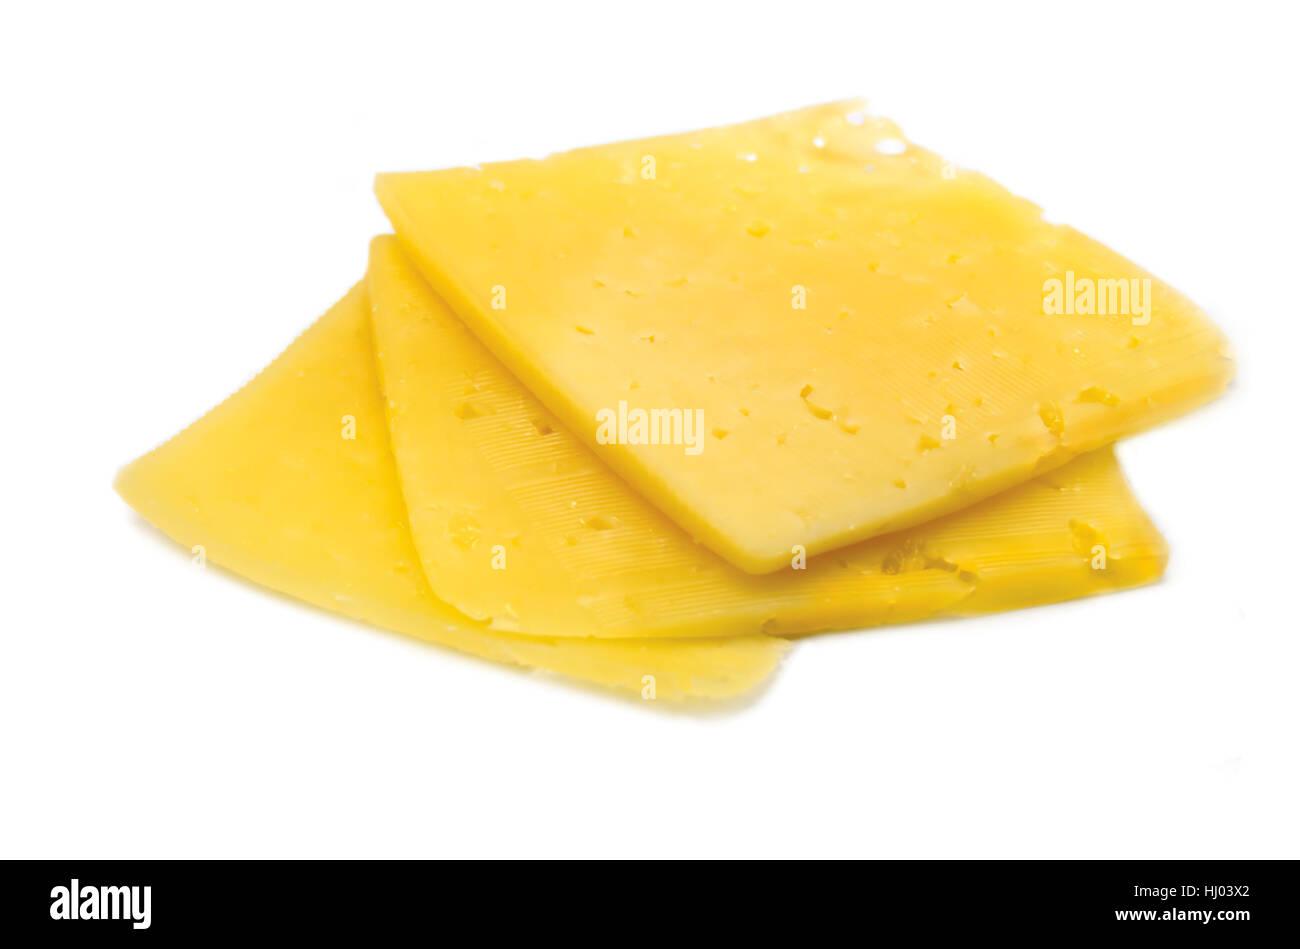 Käsescheiben, isolierte detaillierte Nahaufnahme, Slice-stack Stockbild